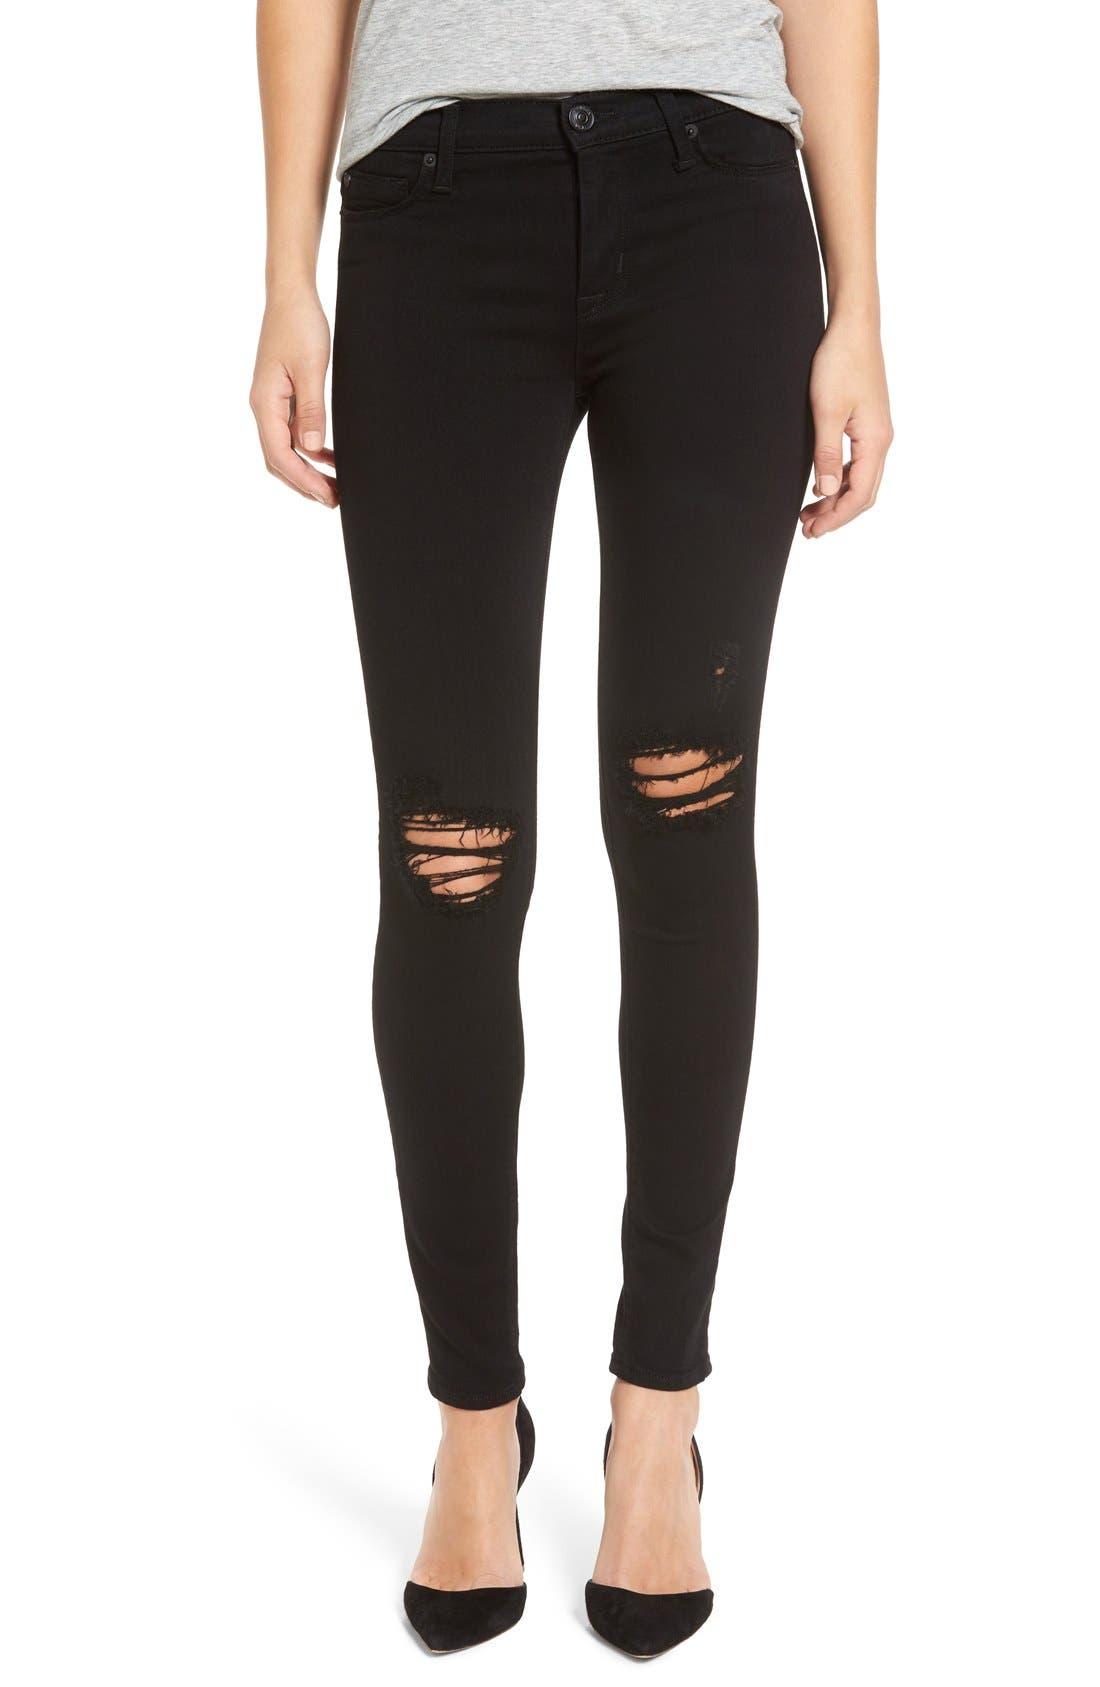 Main Image - Hudson Jeans 'Nico' Skinny Jeans (Ravage)